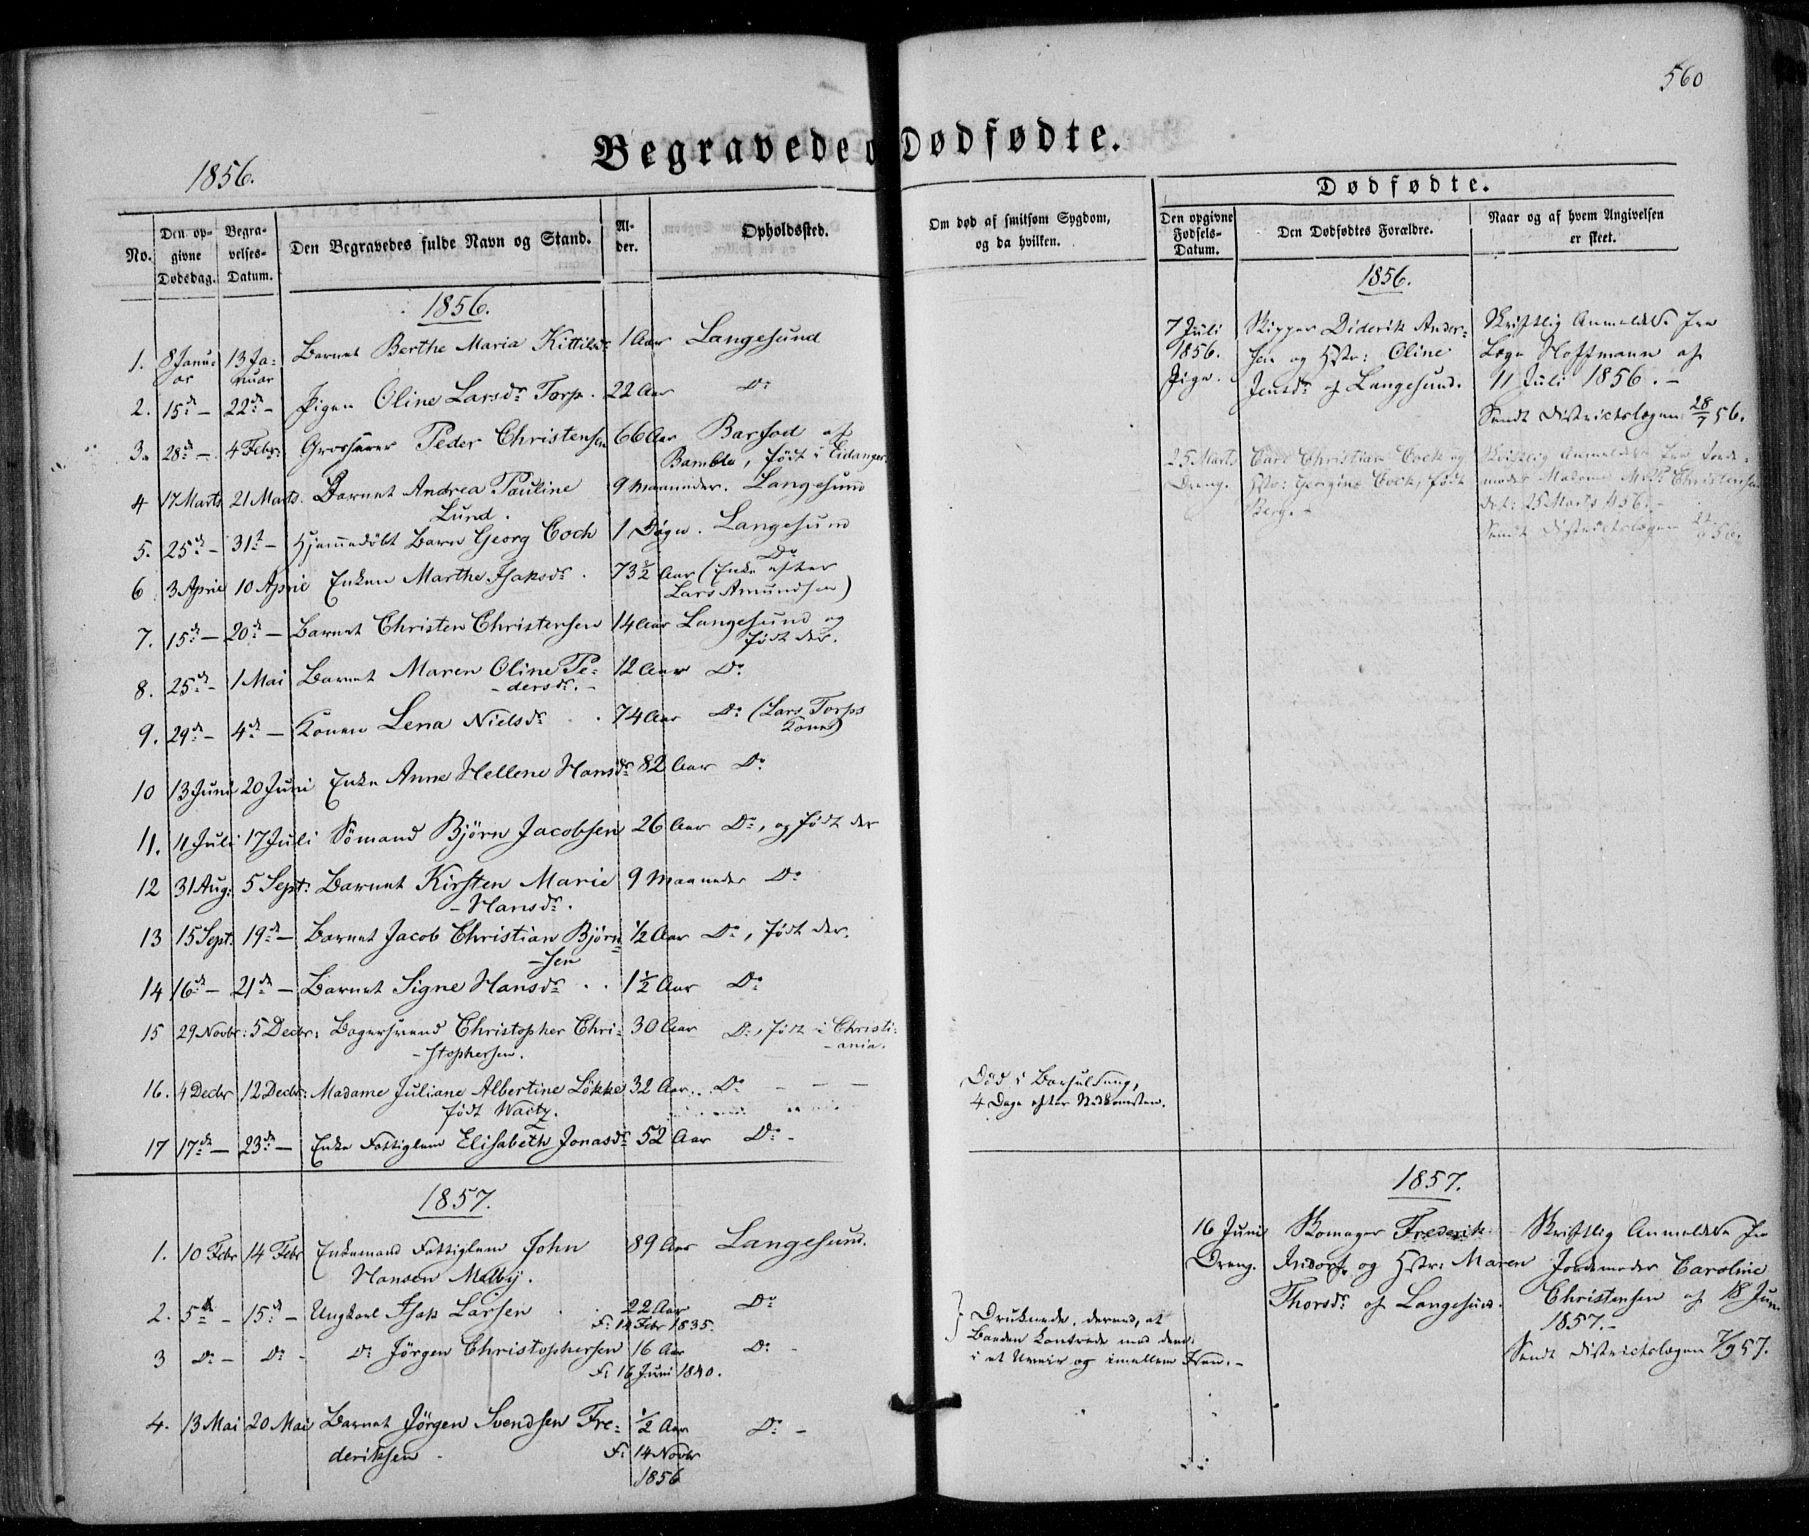 SAKO, Bamble kirkebøker, F/Fa/L0005: Ministerialbok nr. I 5, 1854-1869, s. 560